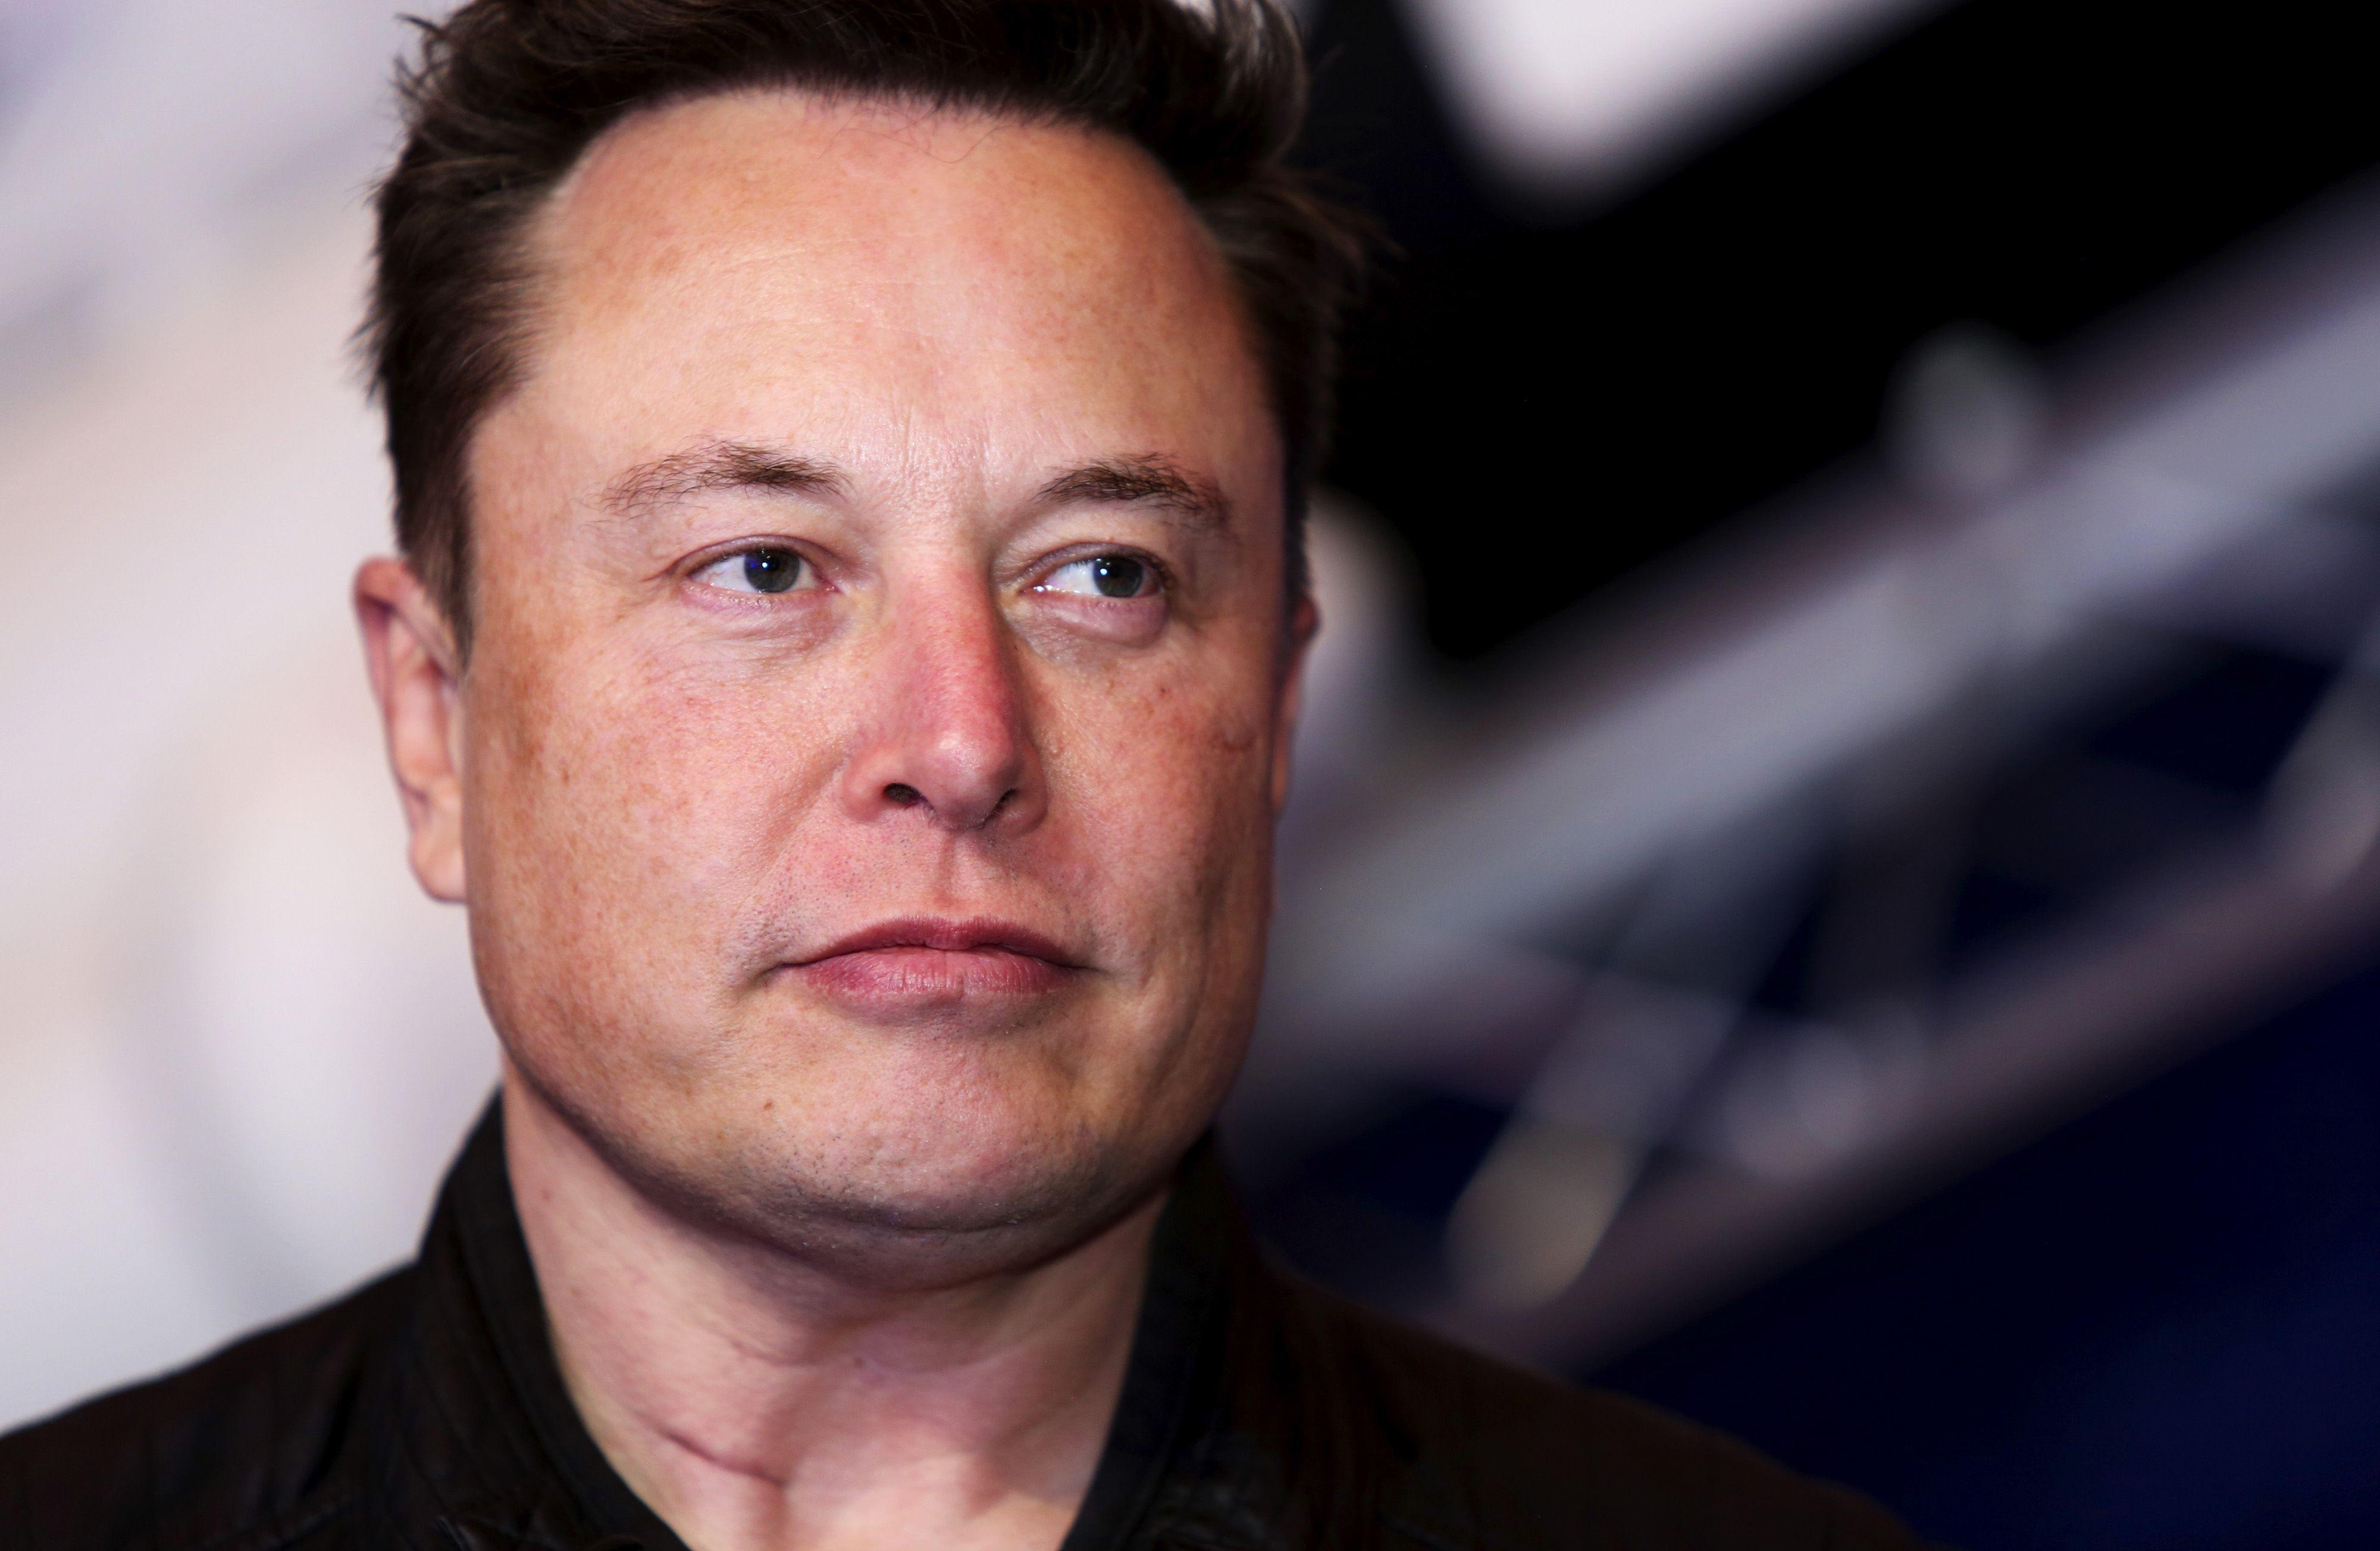 Novogratz calificó como inteligente pero inmaduro a Elon Musk